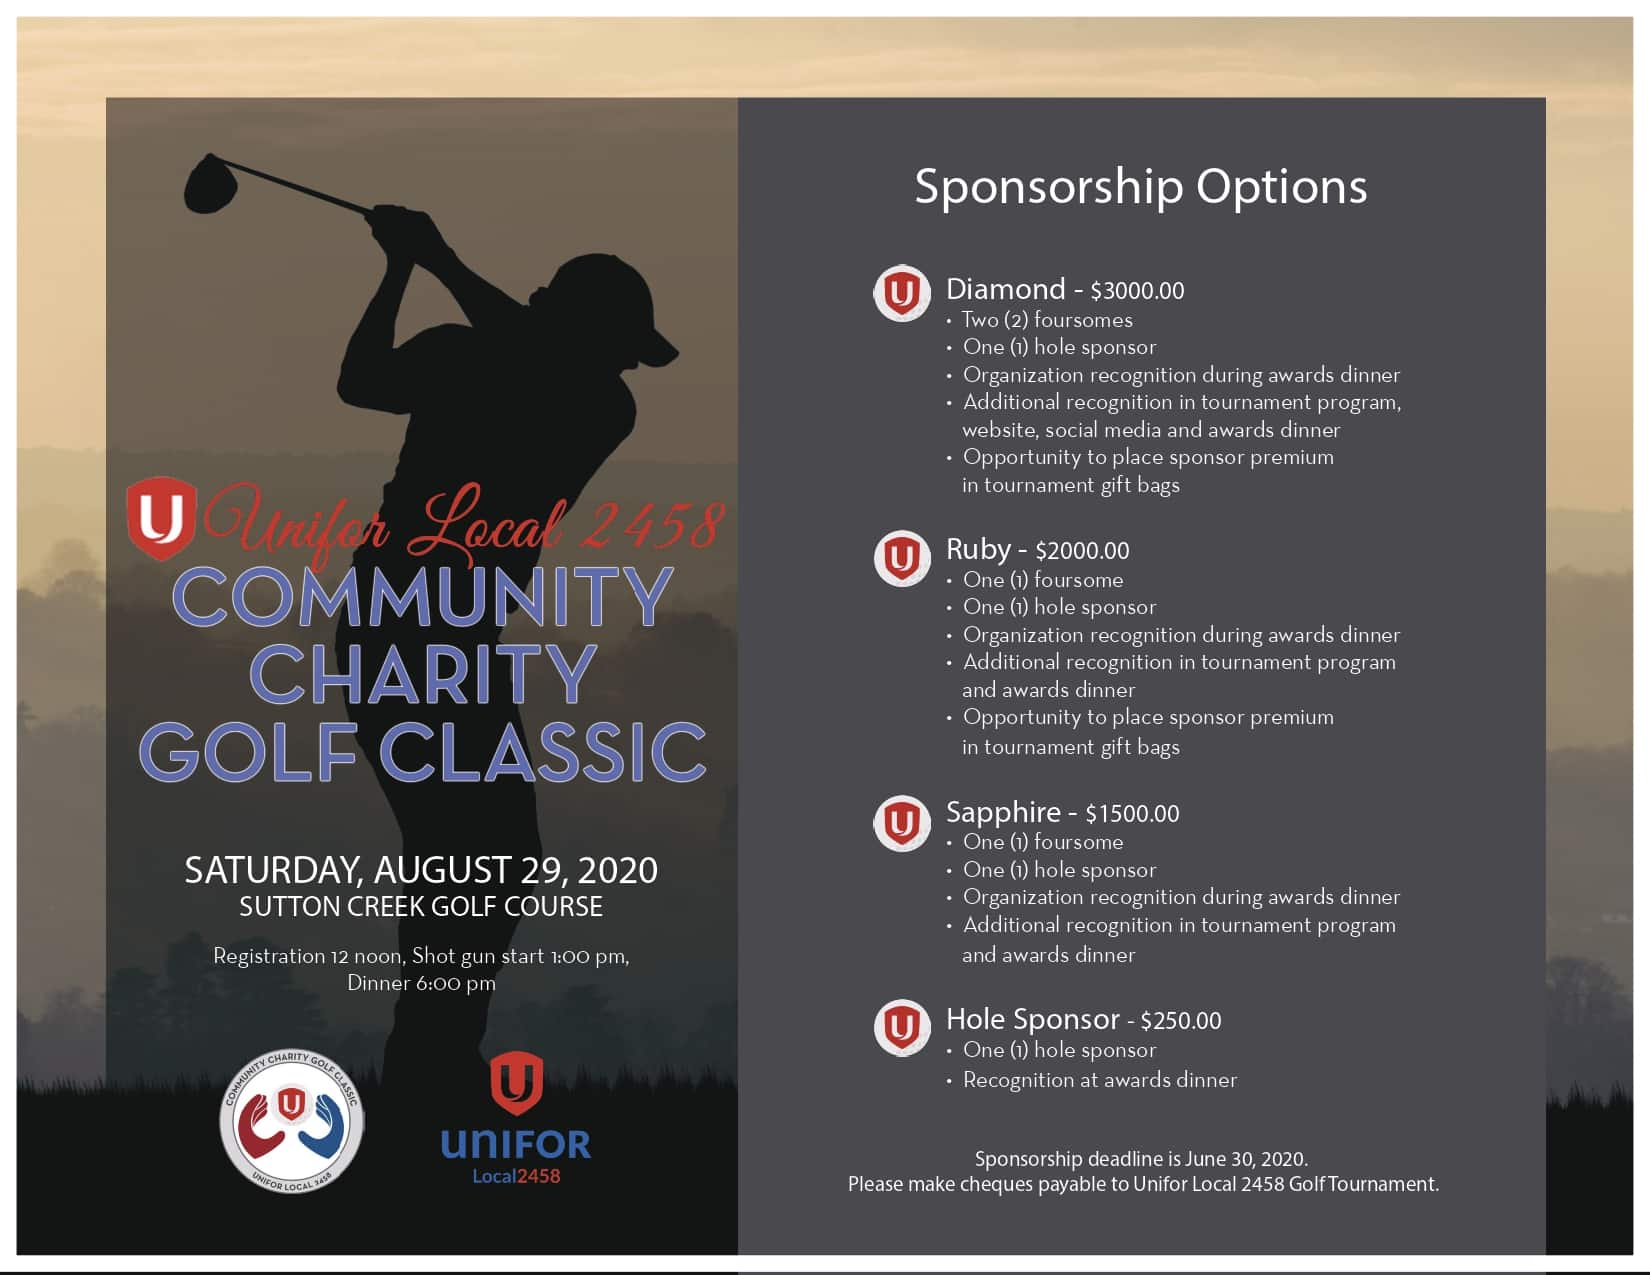 2020 Sponsorship Options_page-0001